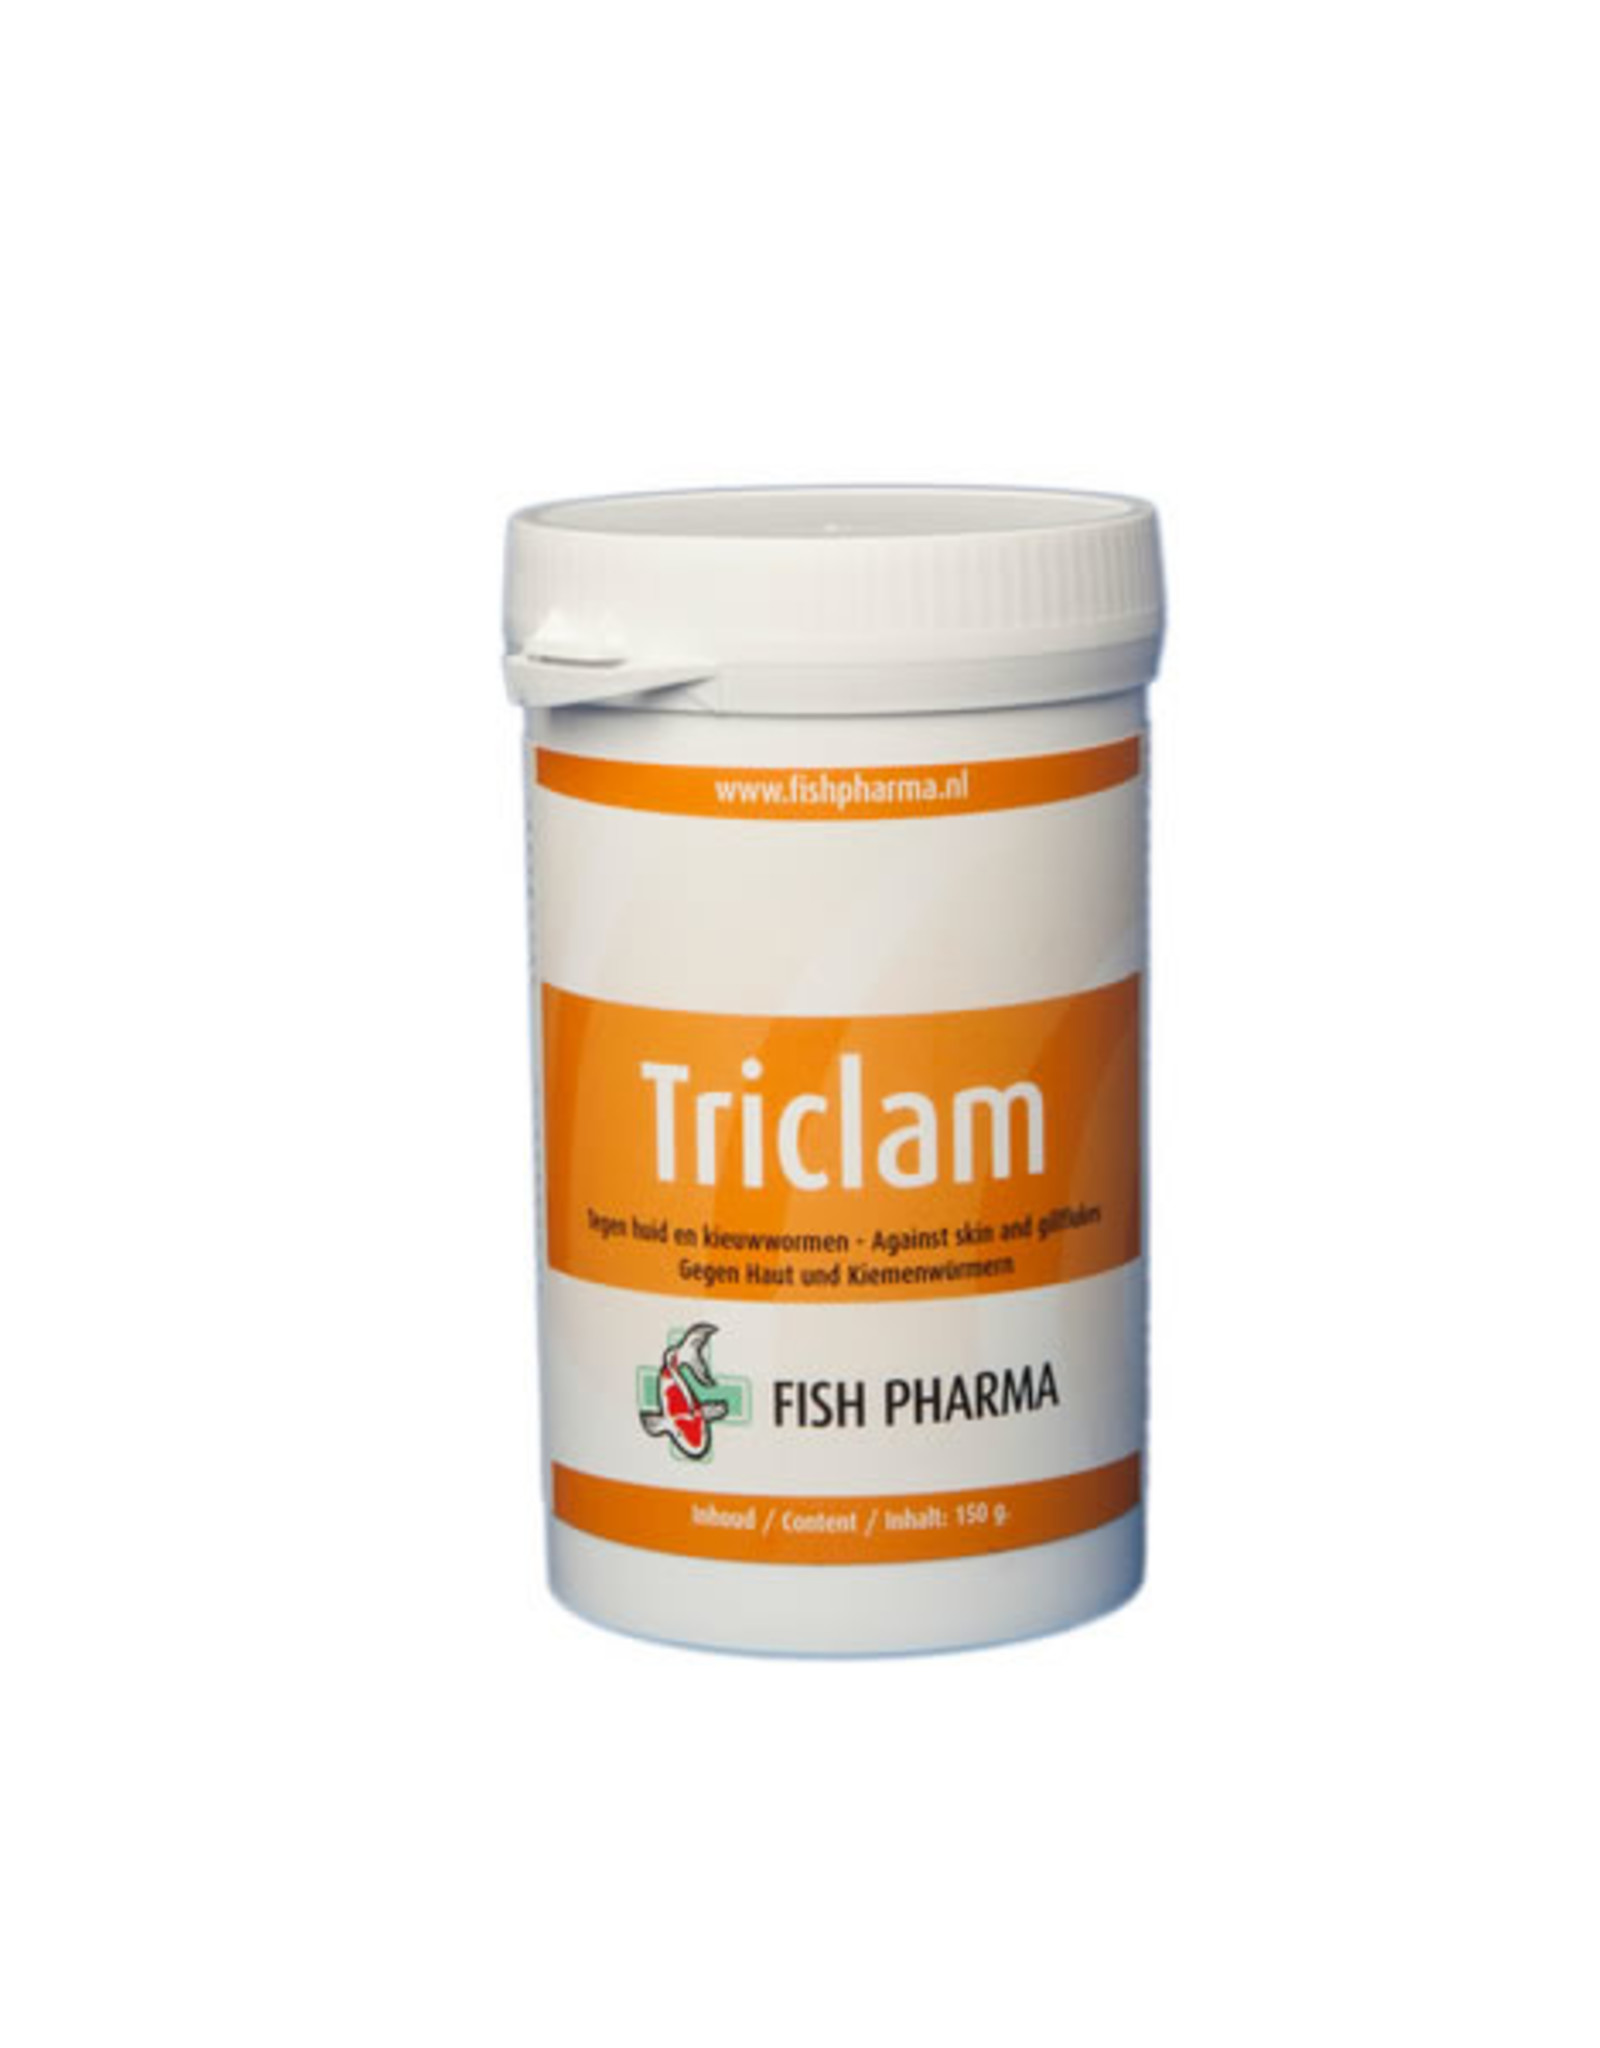 Fish Pharma Triclam tegen huid en kieuwwormen